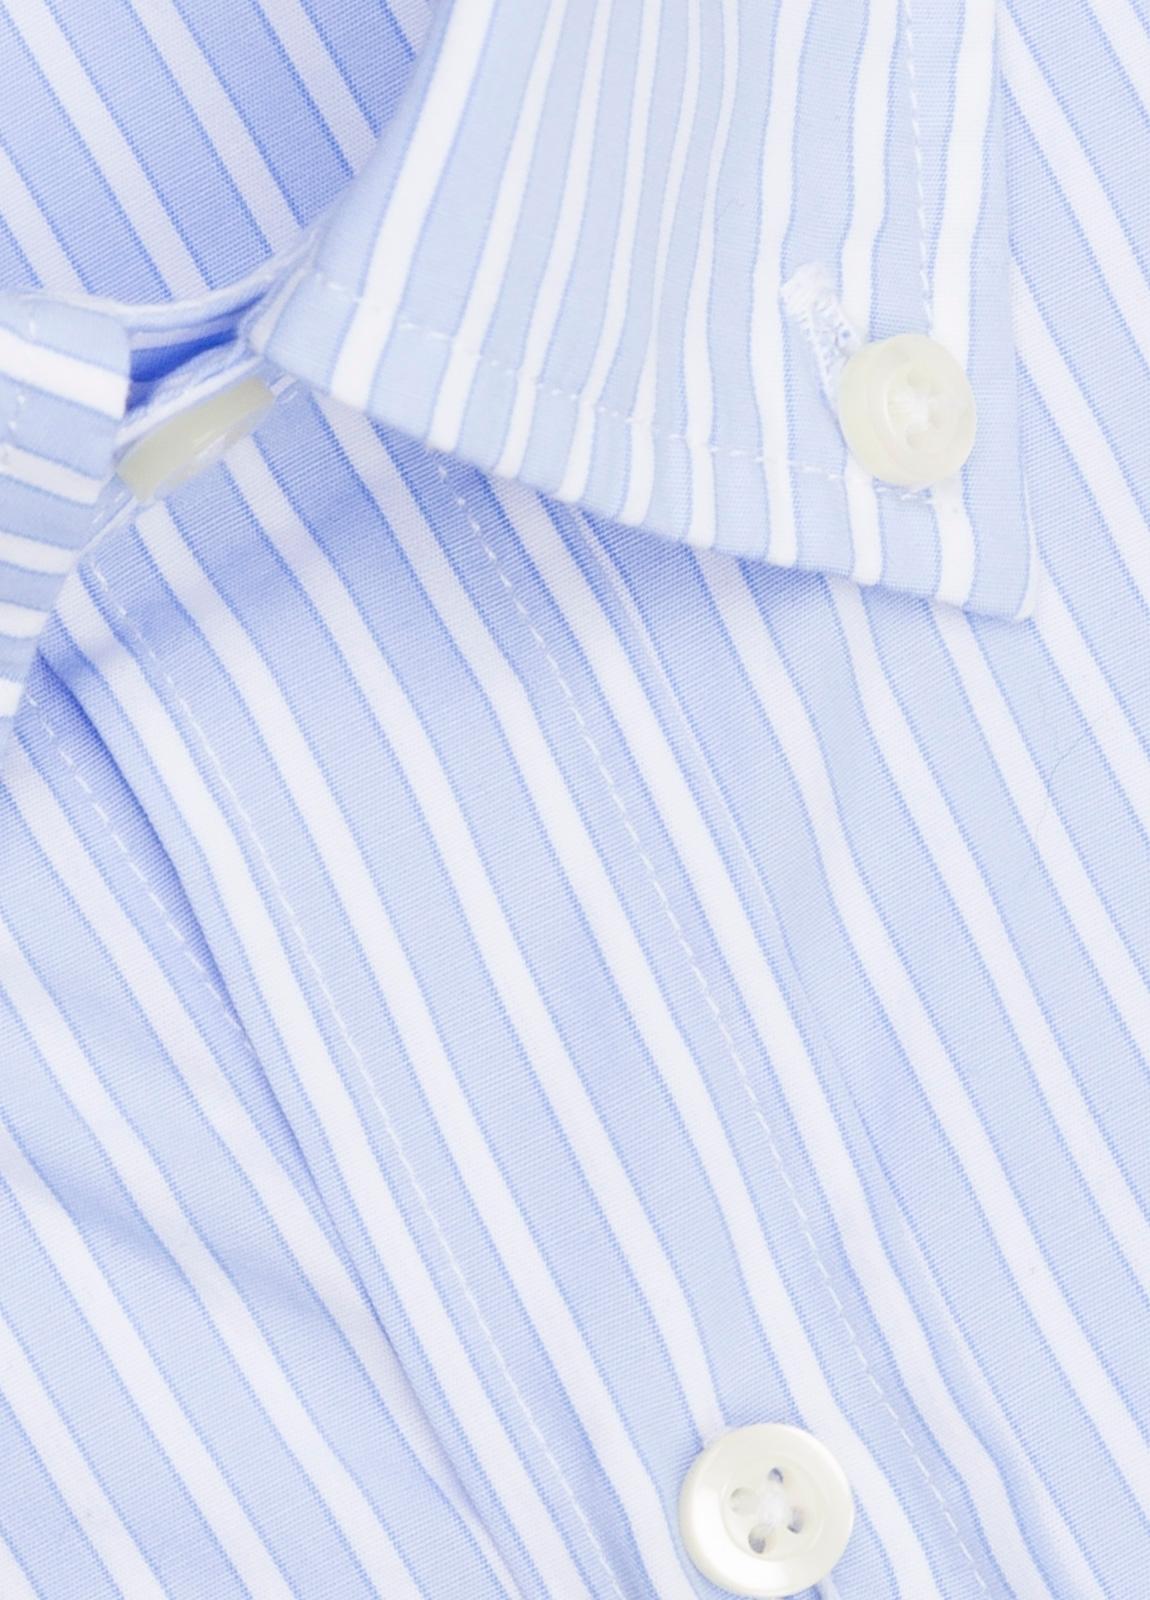 Camisa M/Corta sport FUREST COLECCIÓN Regular FIT rayas celeste - Ítem1